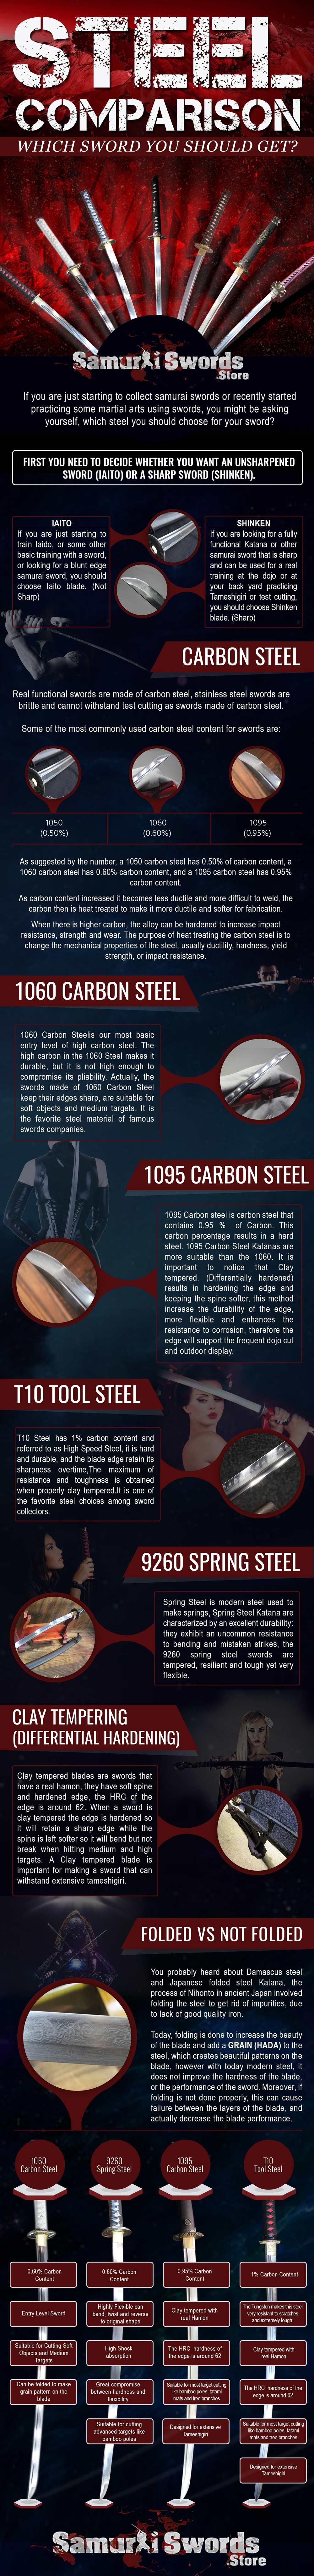 Different Samurai Steels: A Comparison - Infographic